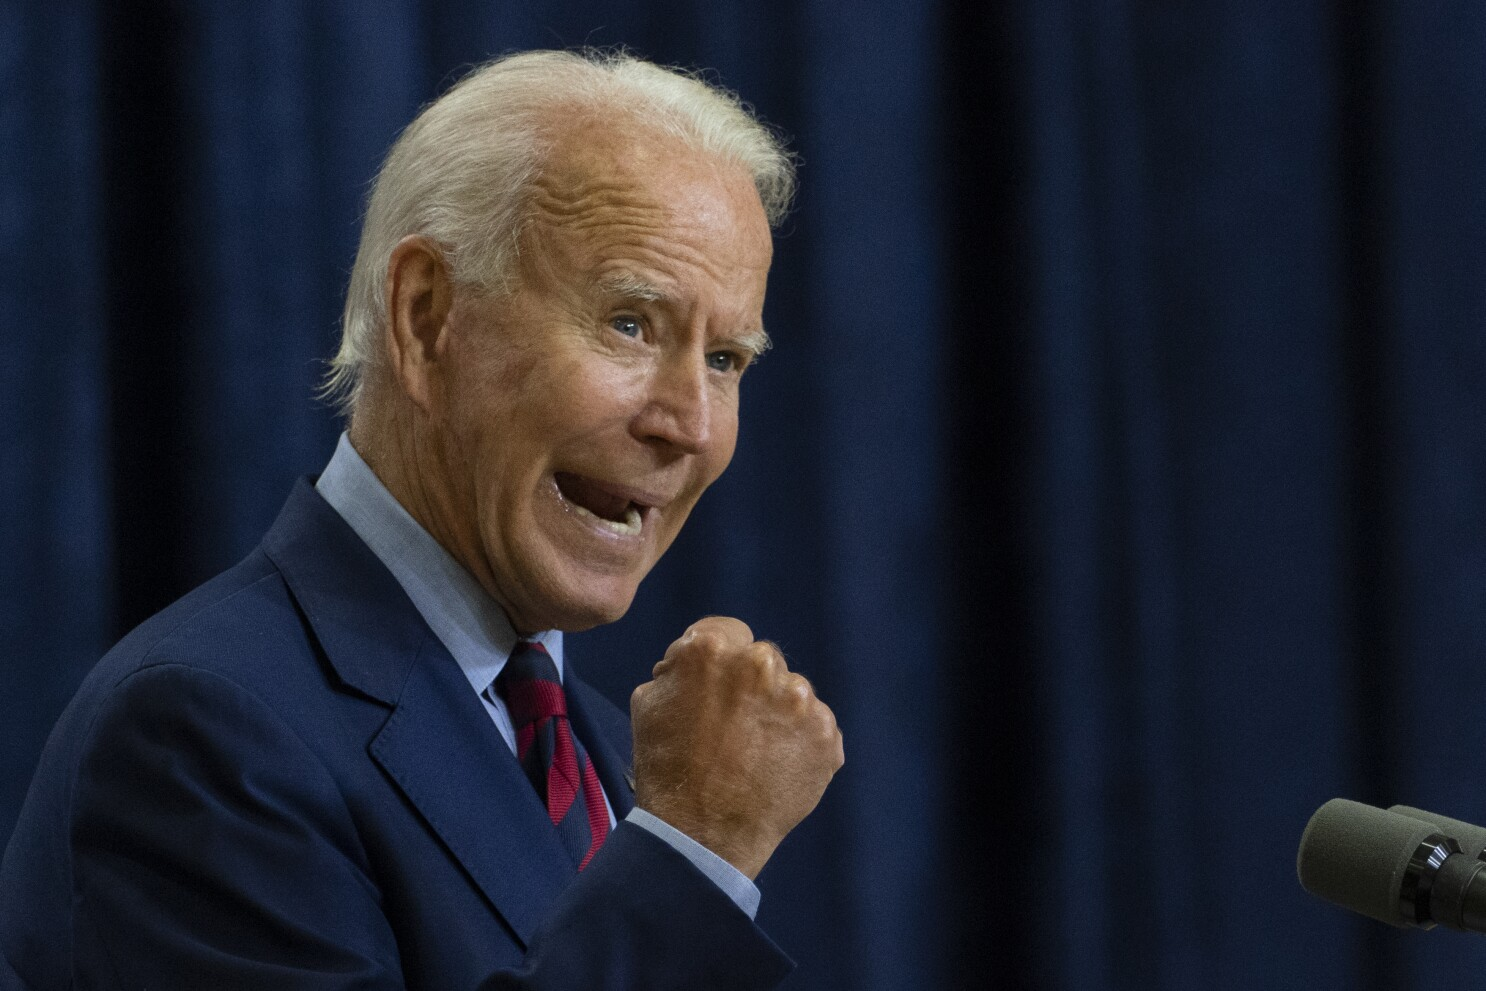 Biden slams Trump for allegedly calling dead troops 'losers' - Los Angeles Times